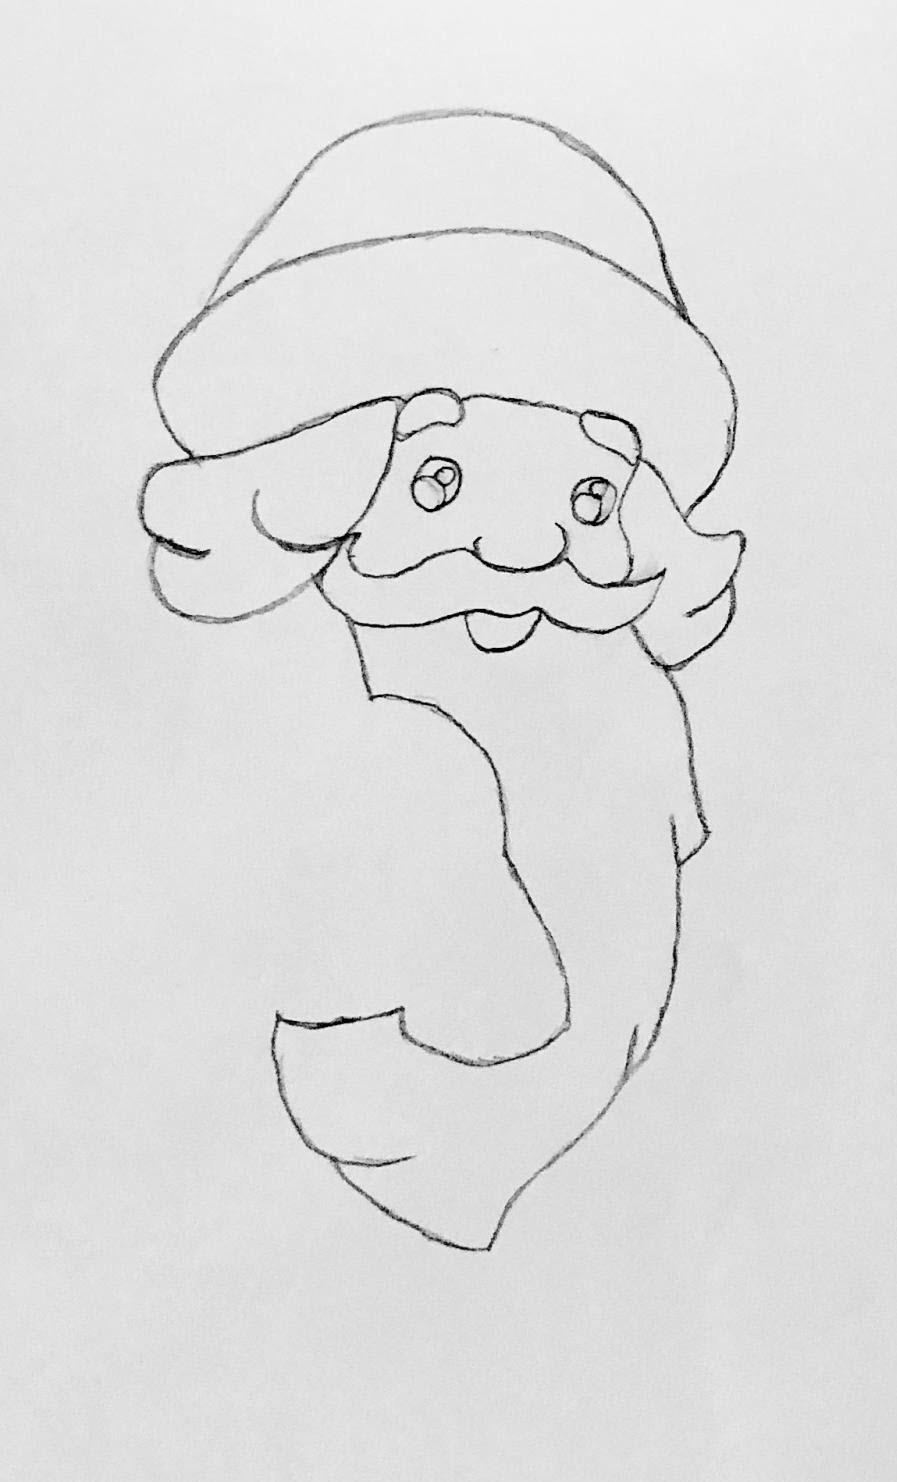 шапка деда мороза раскраска